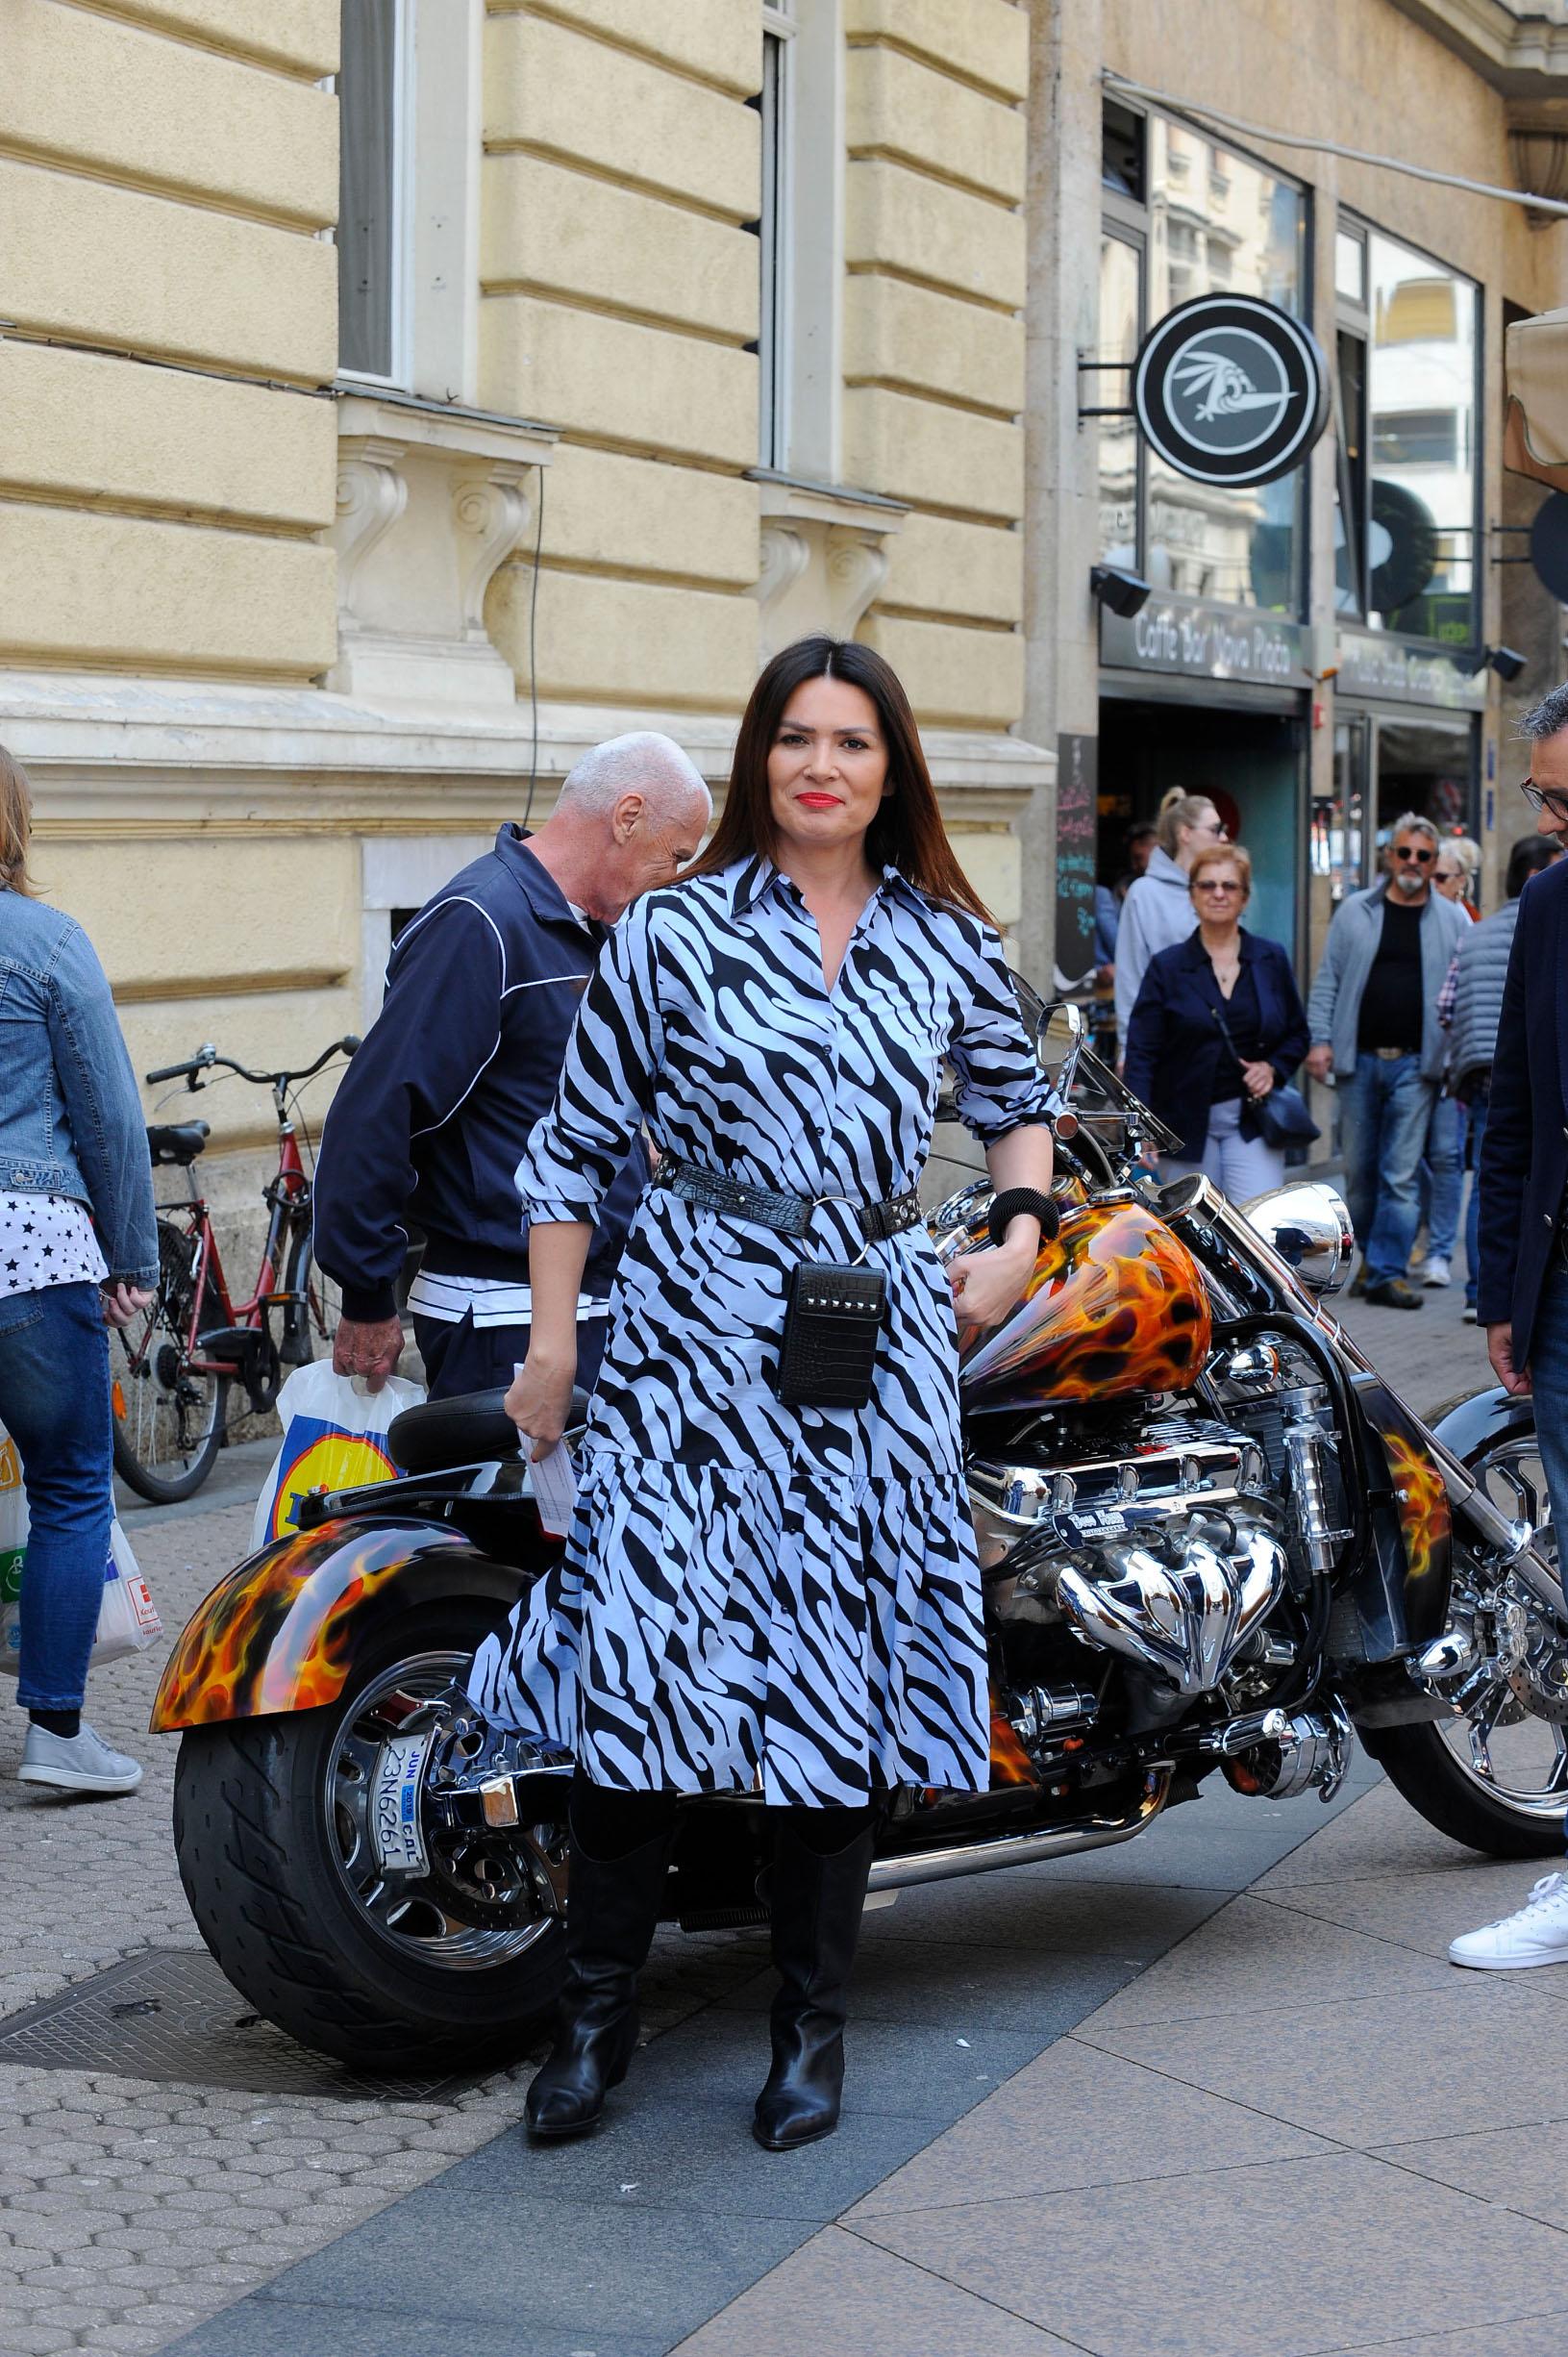 Spica / Zagreb 11.05.2019. / foto: Maja Jurovic / Danijel Despot i Martina Validzic